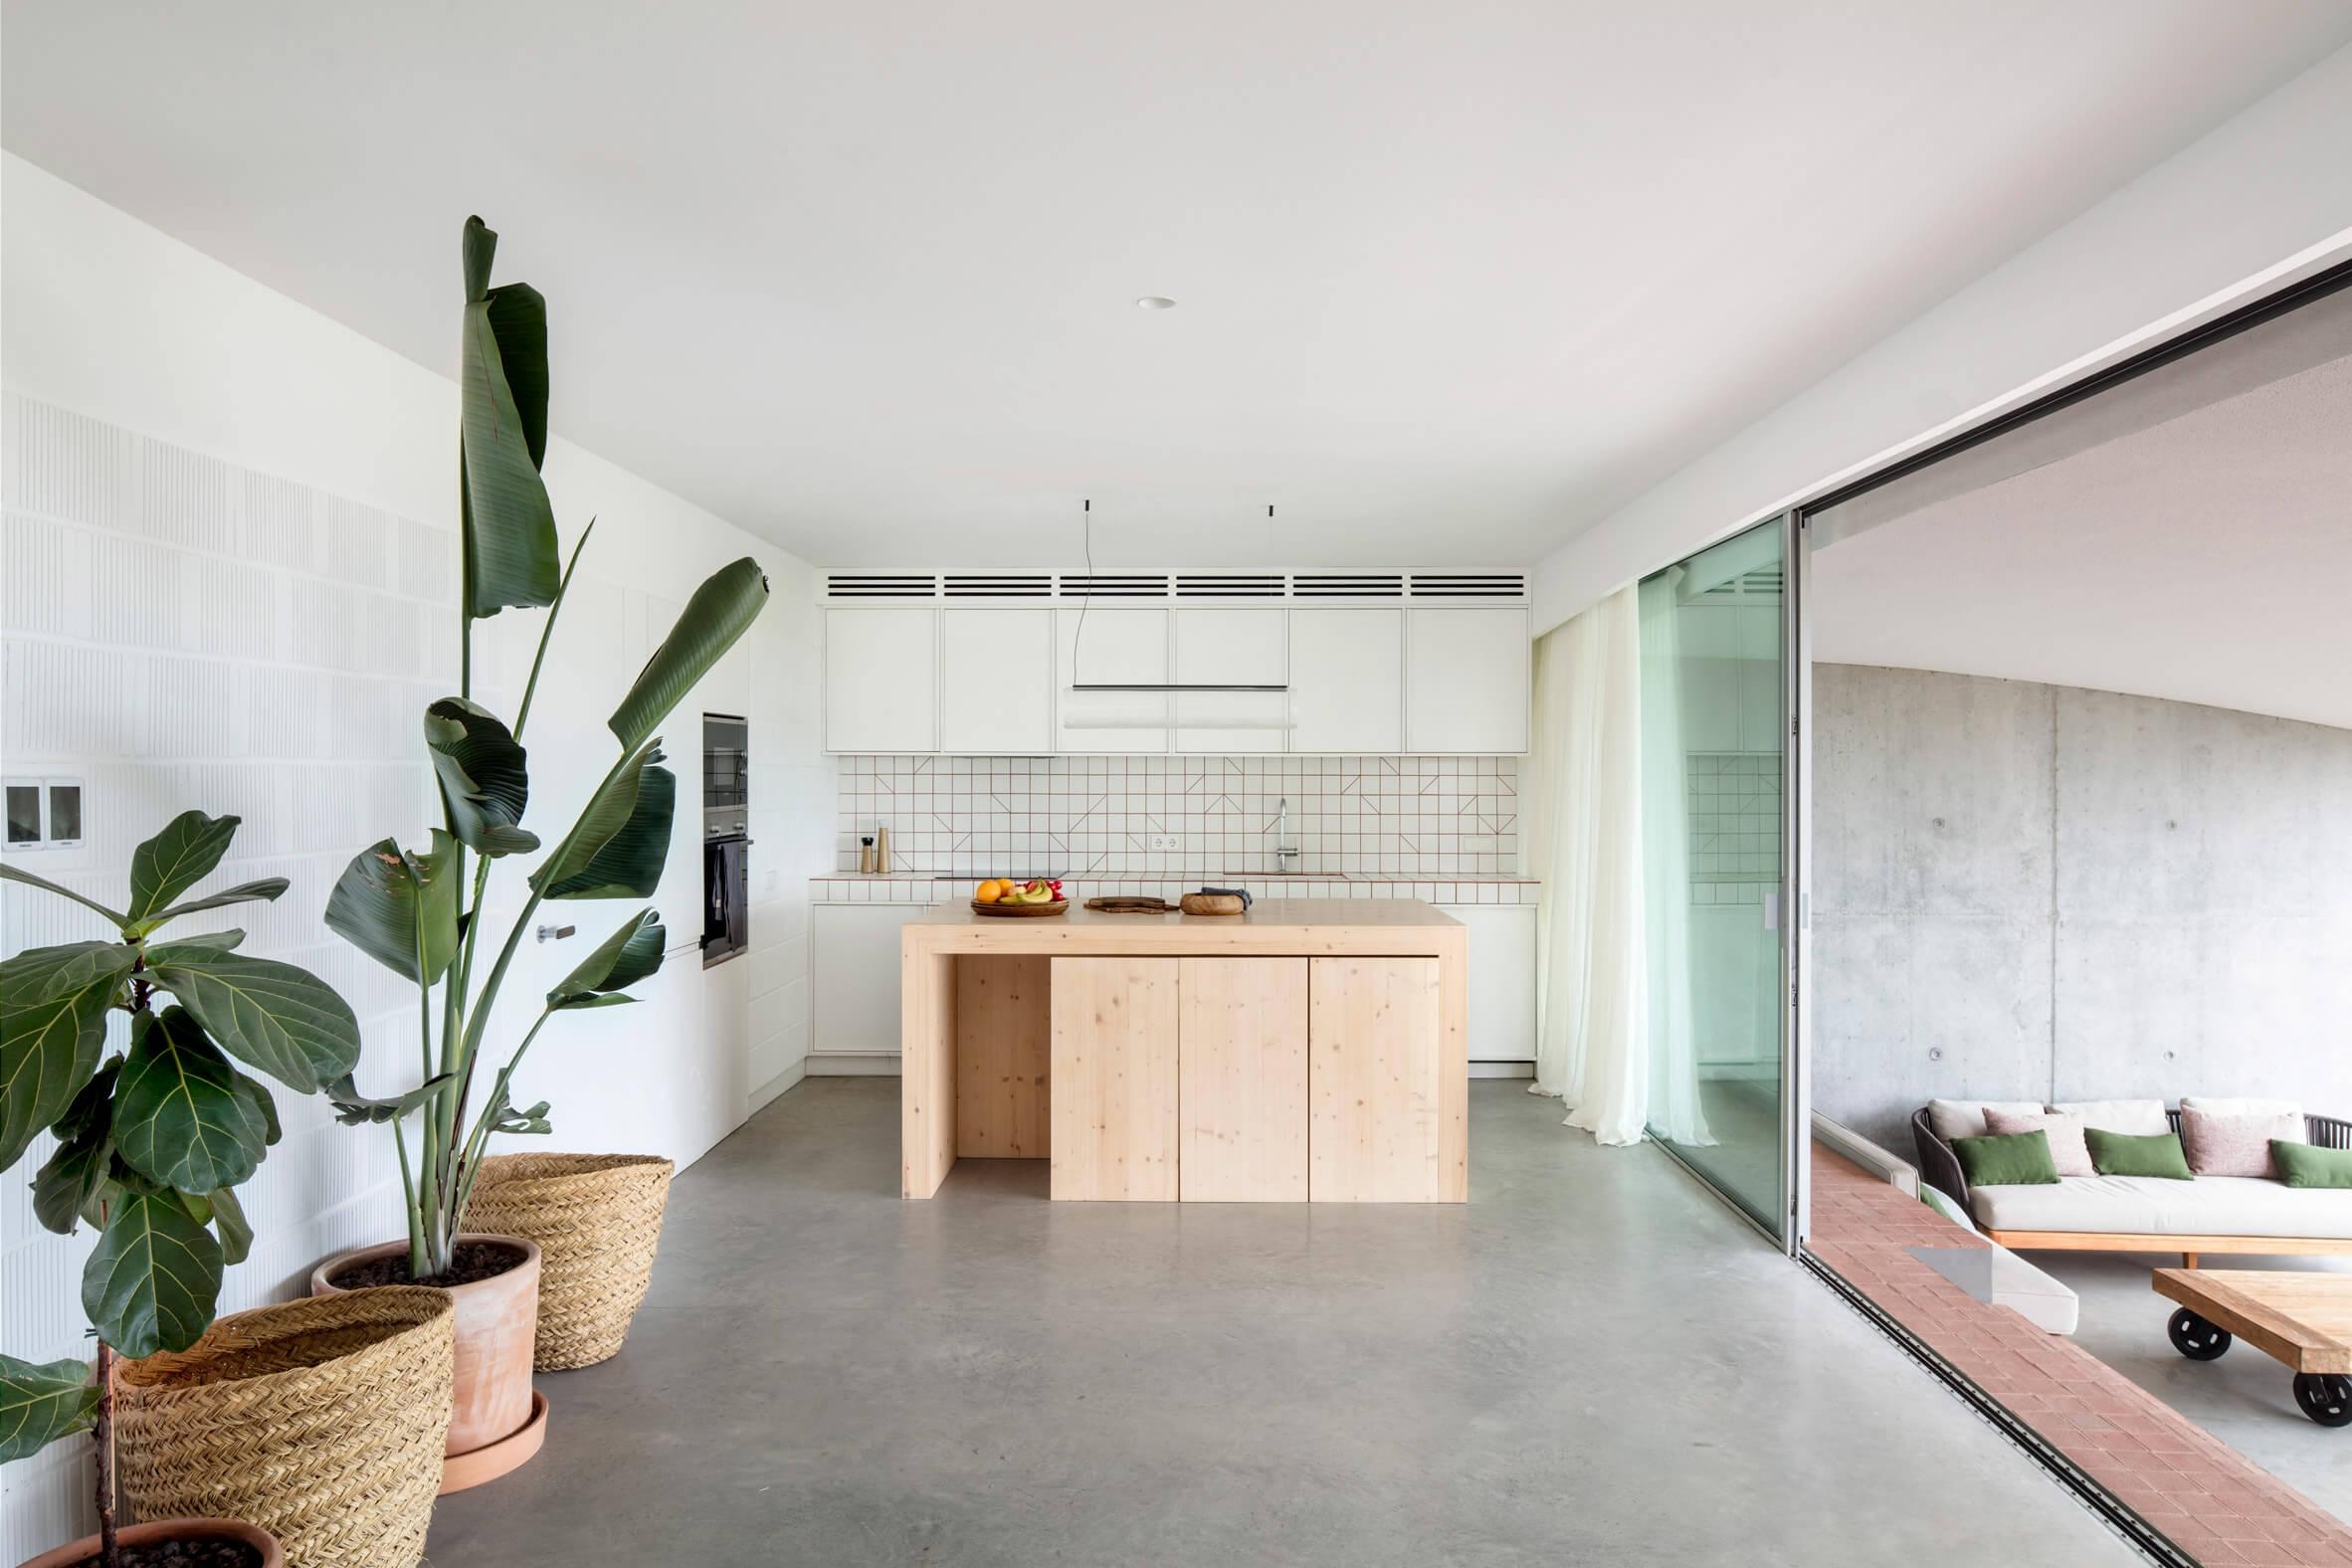 nomo studio curved house menorca spain architecture residential dezeen 2364 col 7